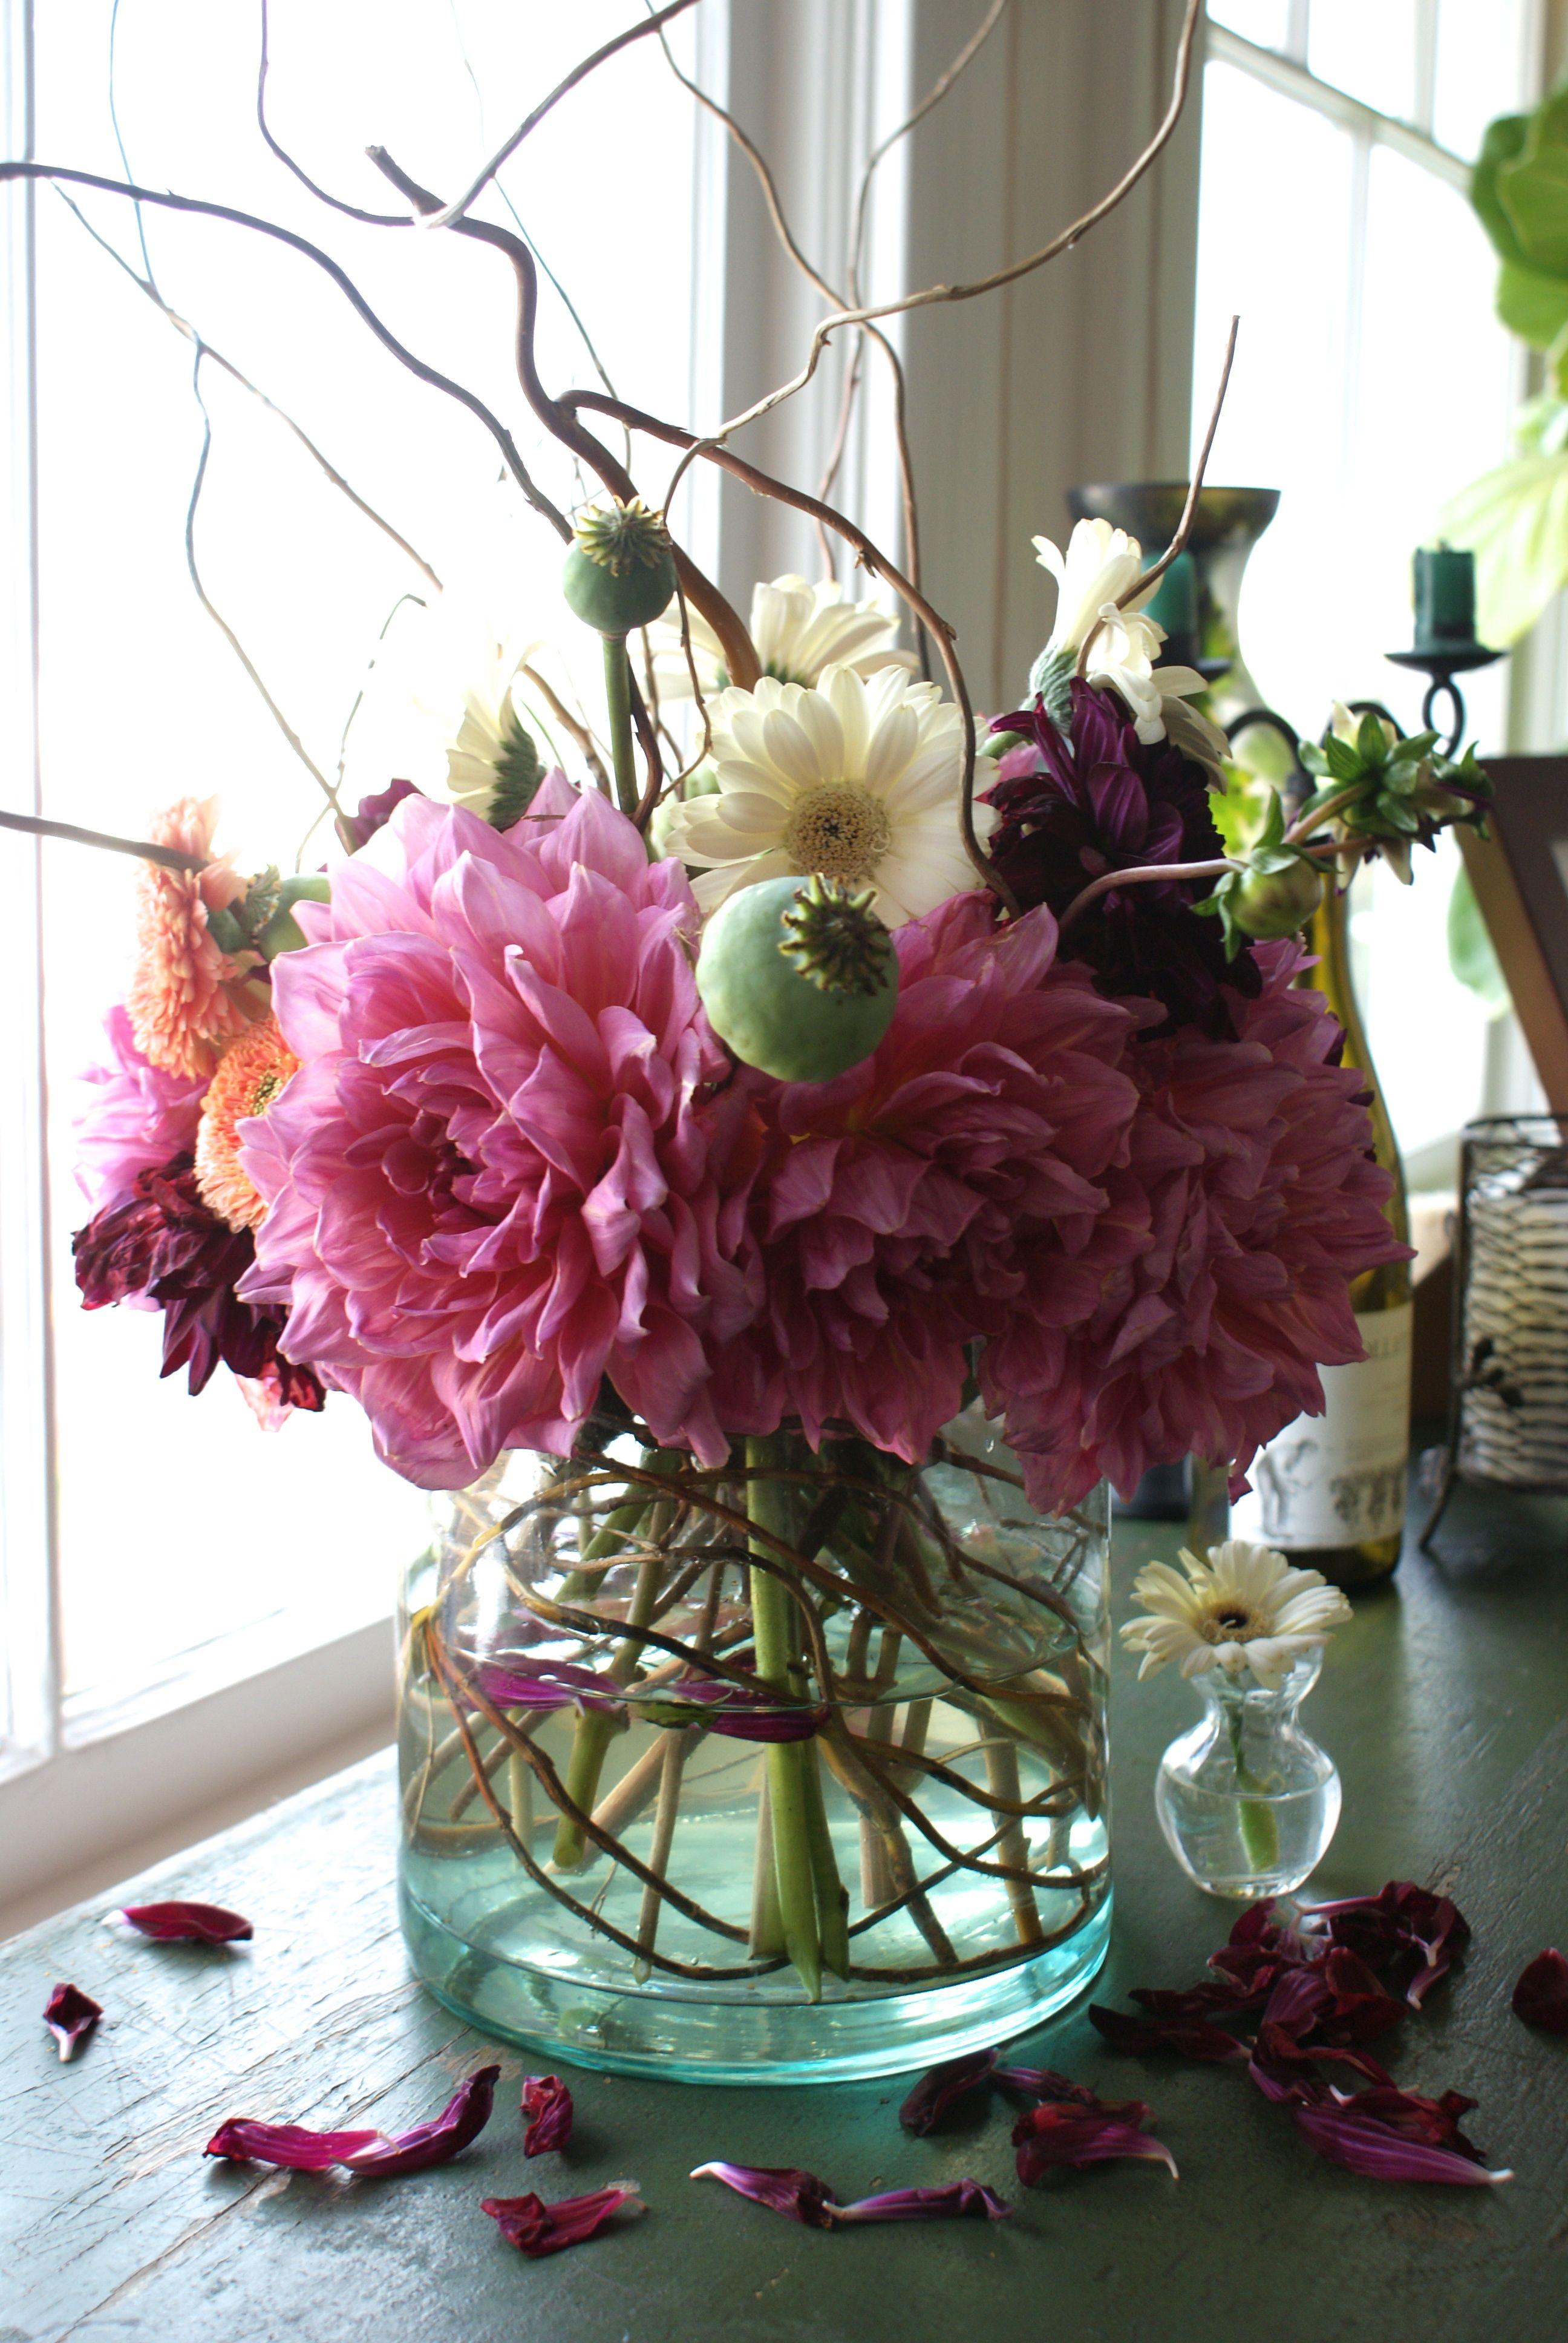 Dinner Plate Dahlias Flower Vase Arrangements Vase Design Rustic Vase